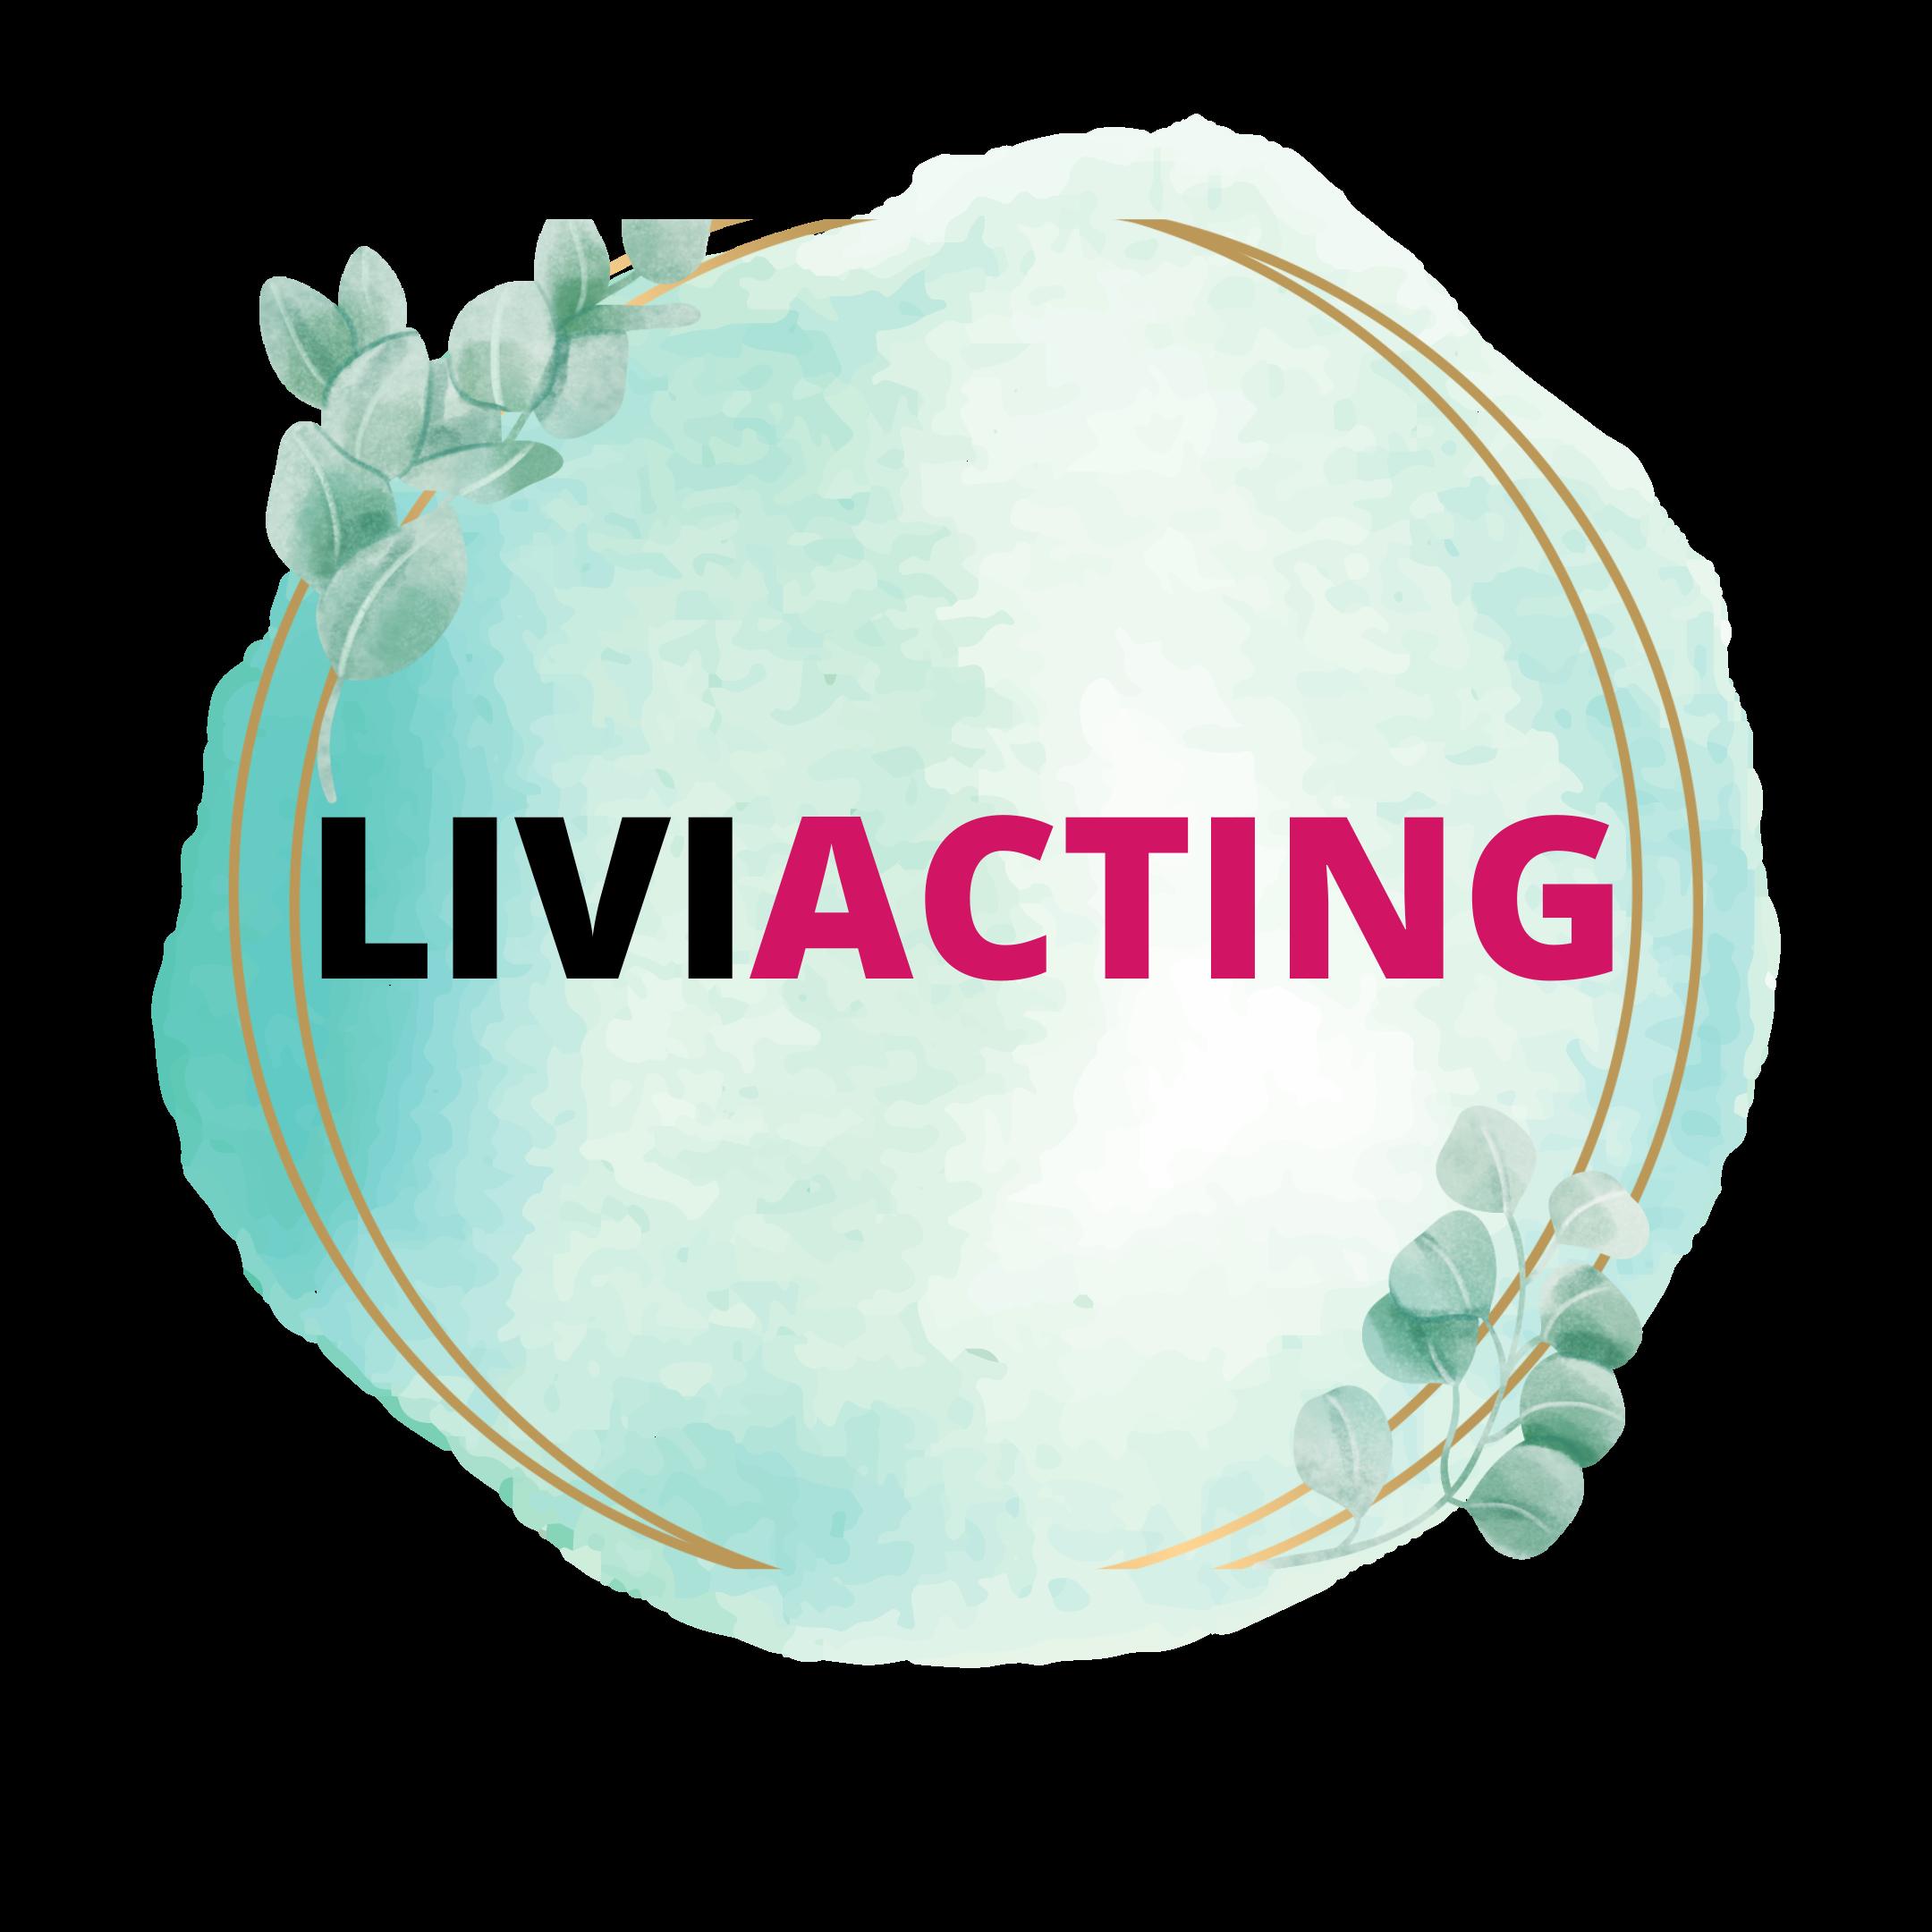 Liviacting